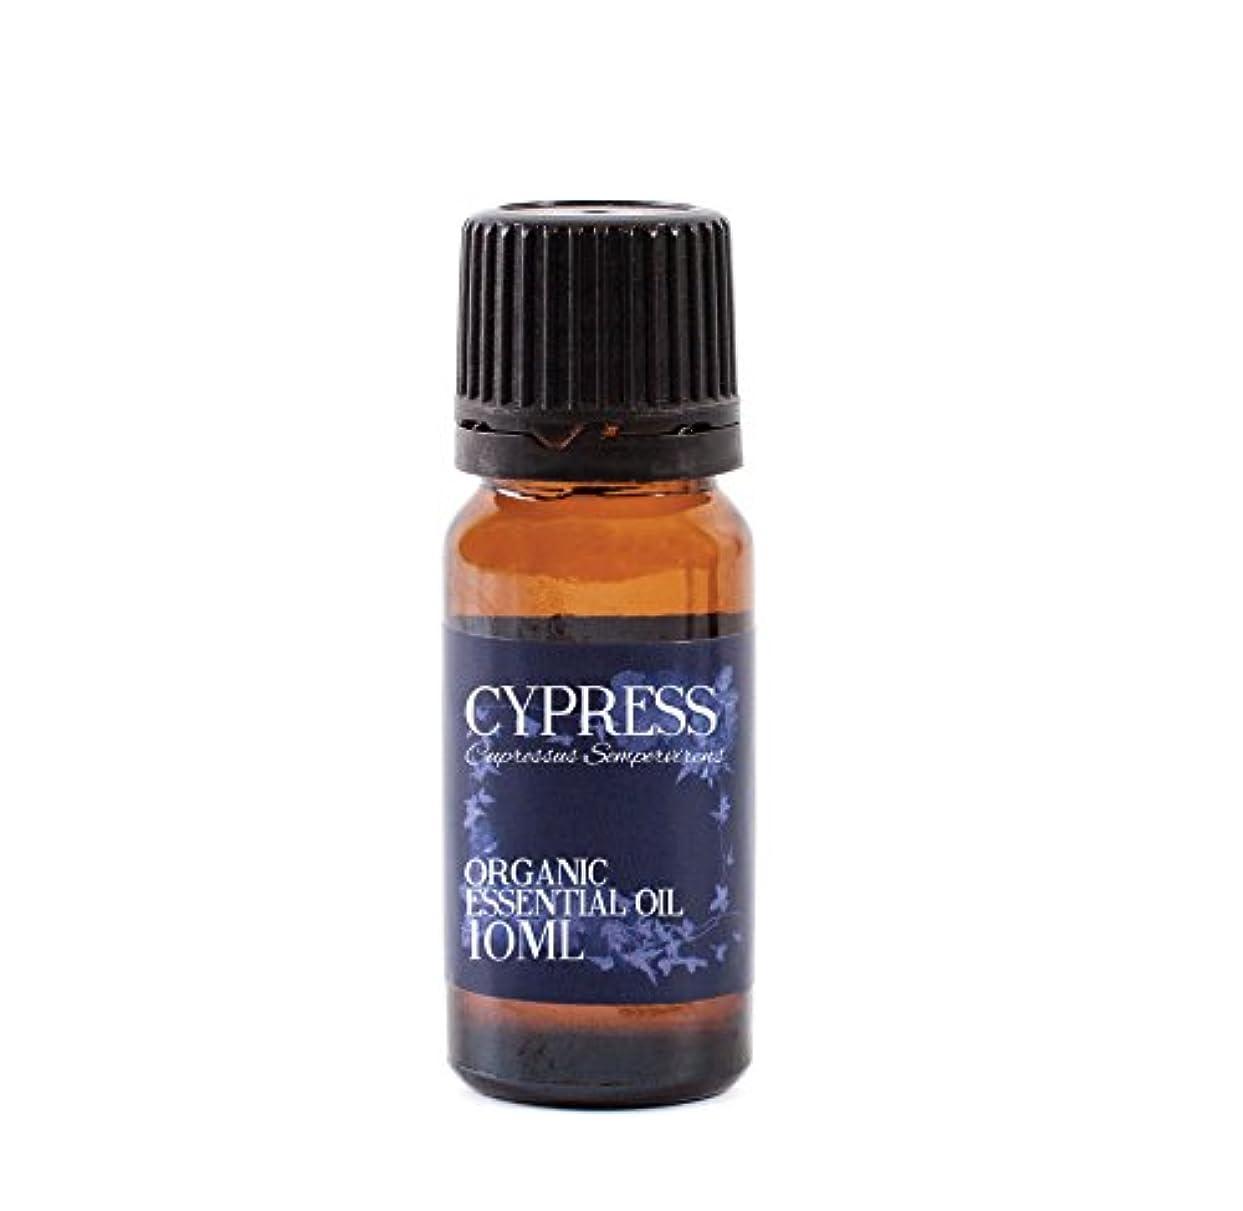 行花婿無視Cypress Organic Essential Oil - 10ml - 100% Pure